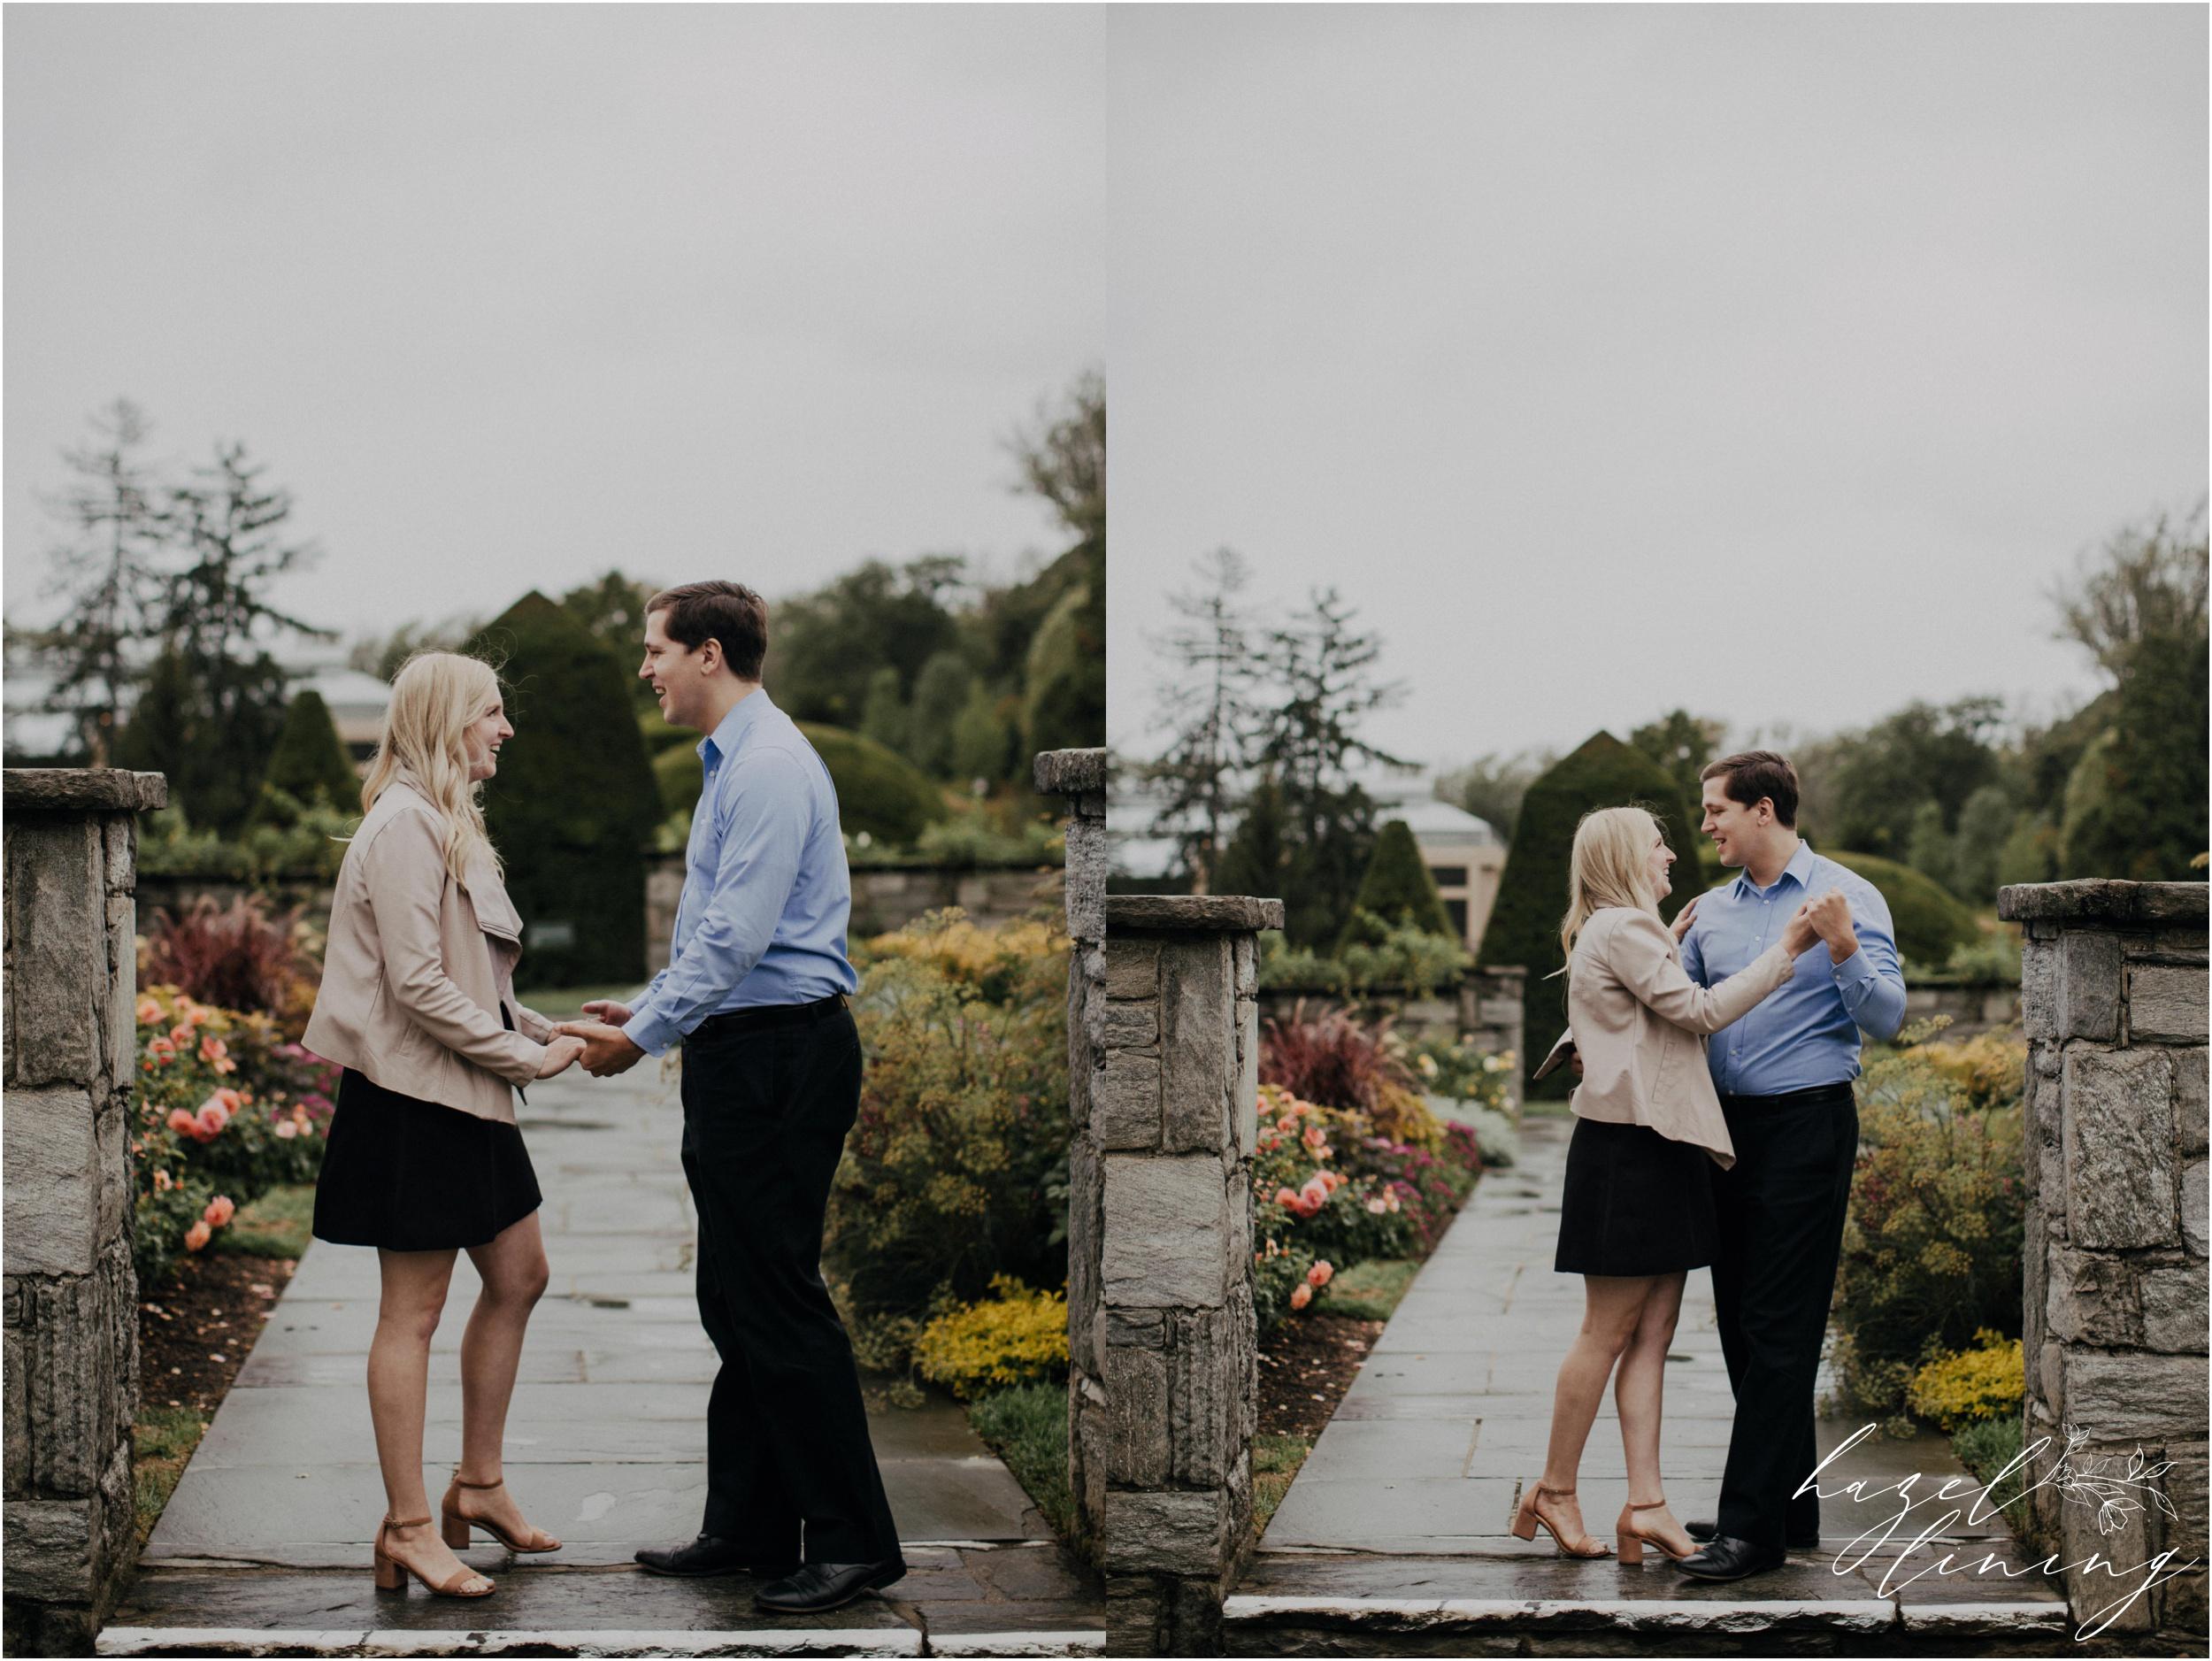 victoria-travis-logan-mayes-longwood-gardens-kennett-square-philadelphia-engagement-session-hazel-lining-photography-destination-elopement-wedding-engagement-photography_0003.jpg